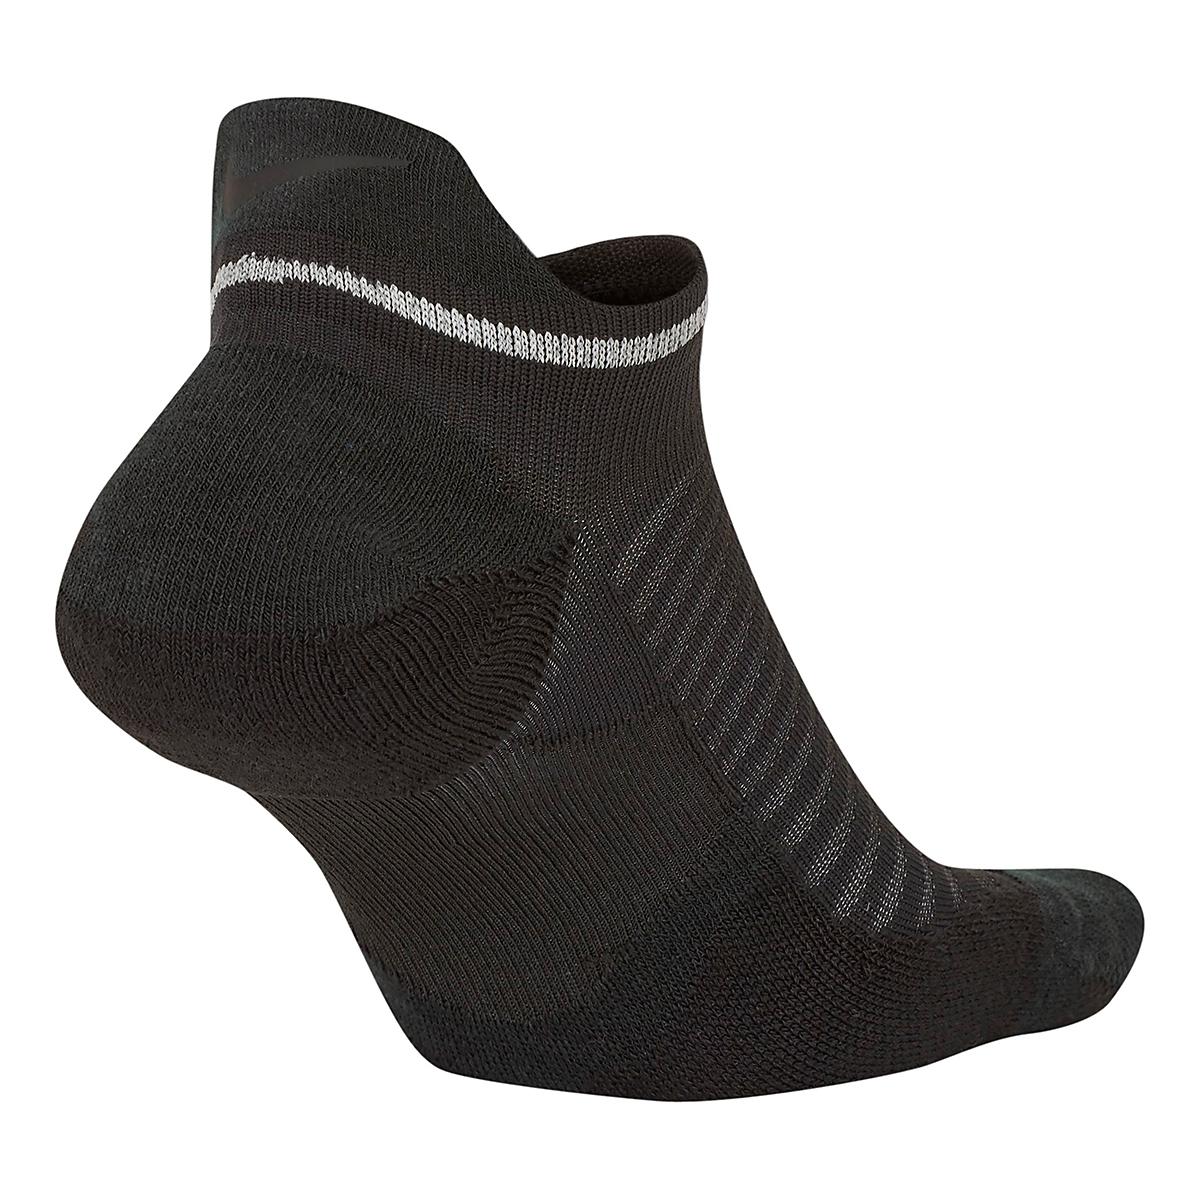 Nike Spark Cushion No Show Sock - Color: Black - Size: 4/5.5, Black, large, image 2